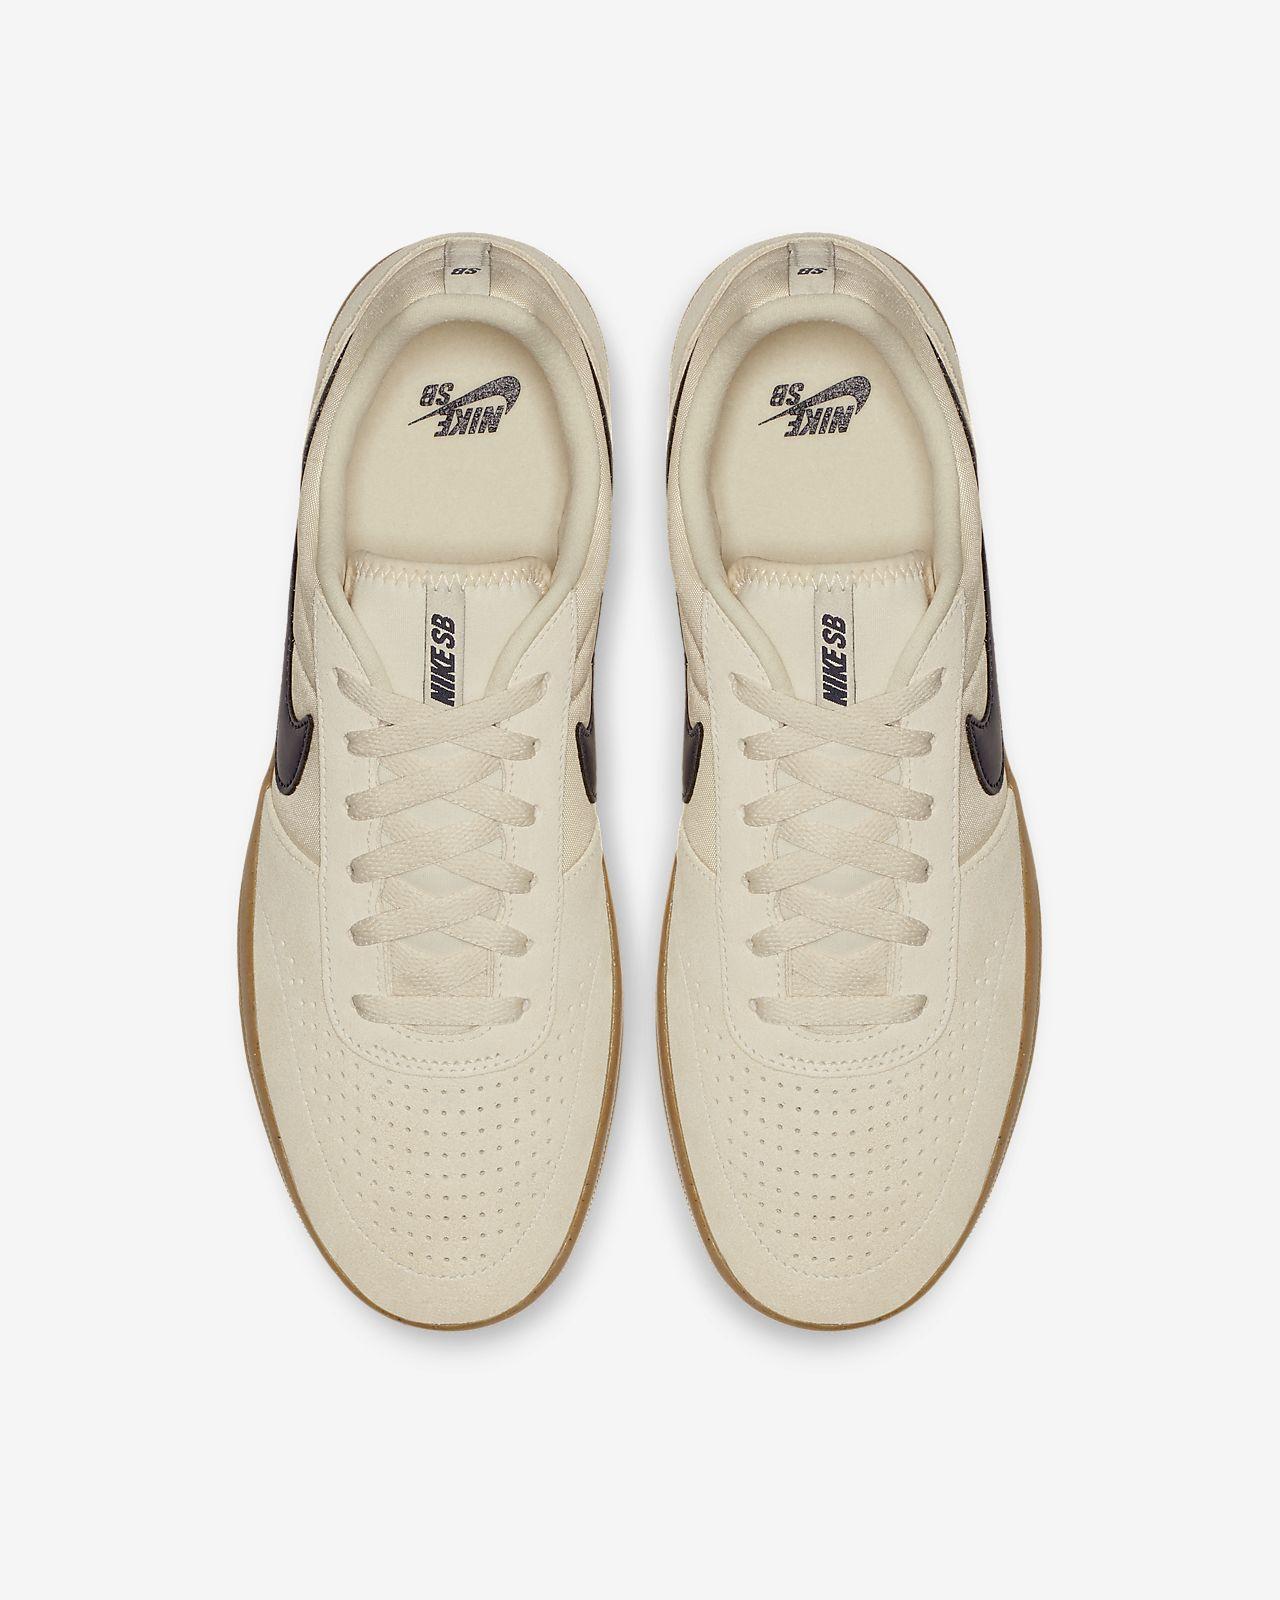 official photos 3301f f4982 ... Nike SB Team Classic Men s Skate Shoe